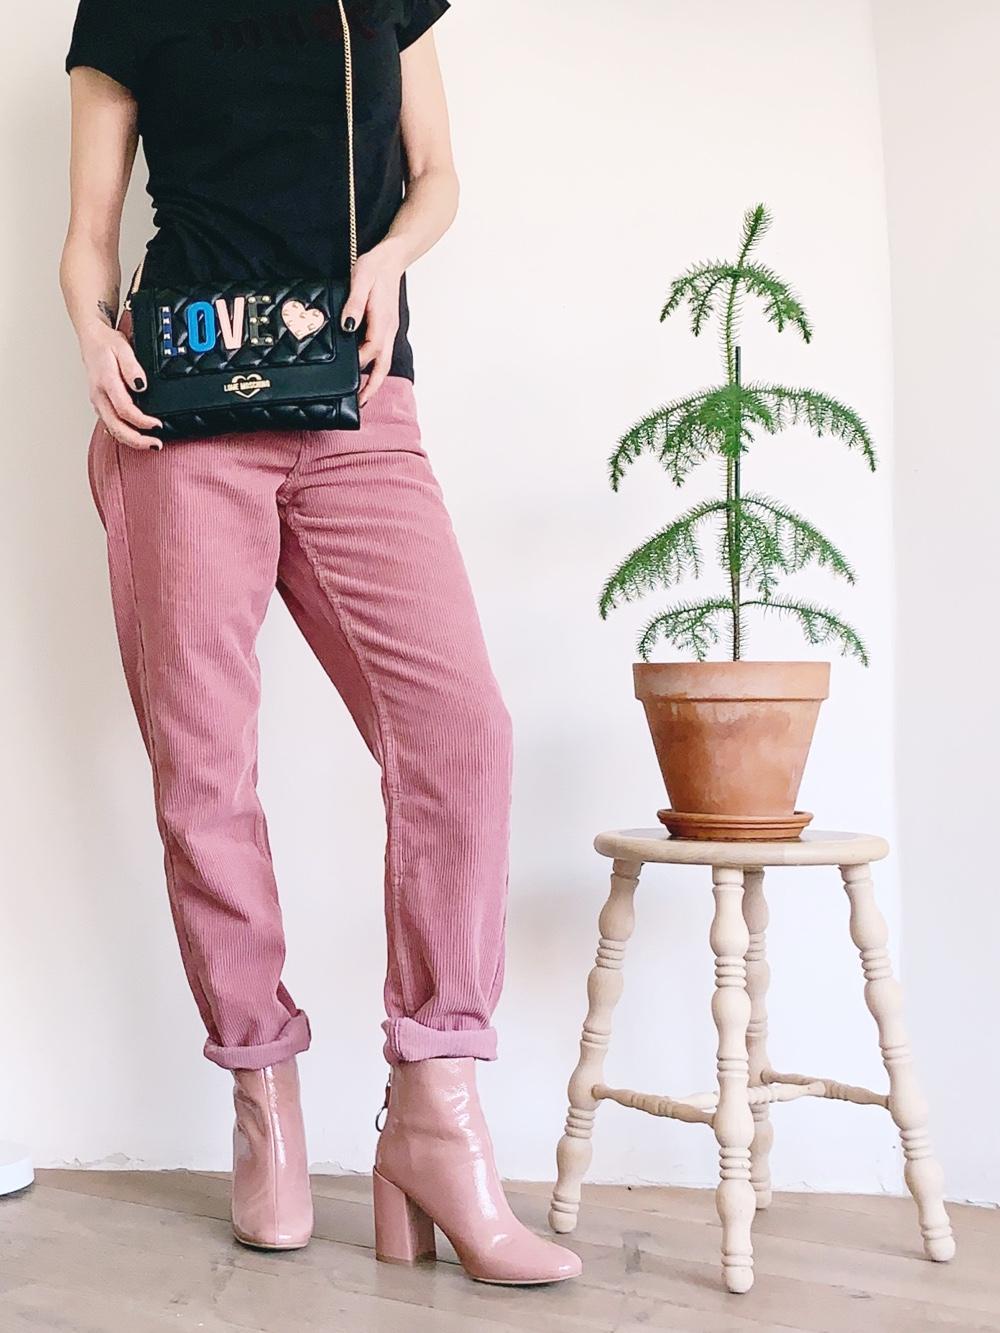 fashionpost: pink trousers inspiration